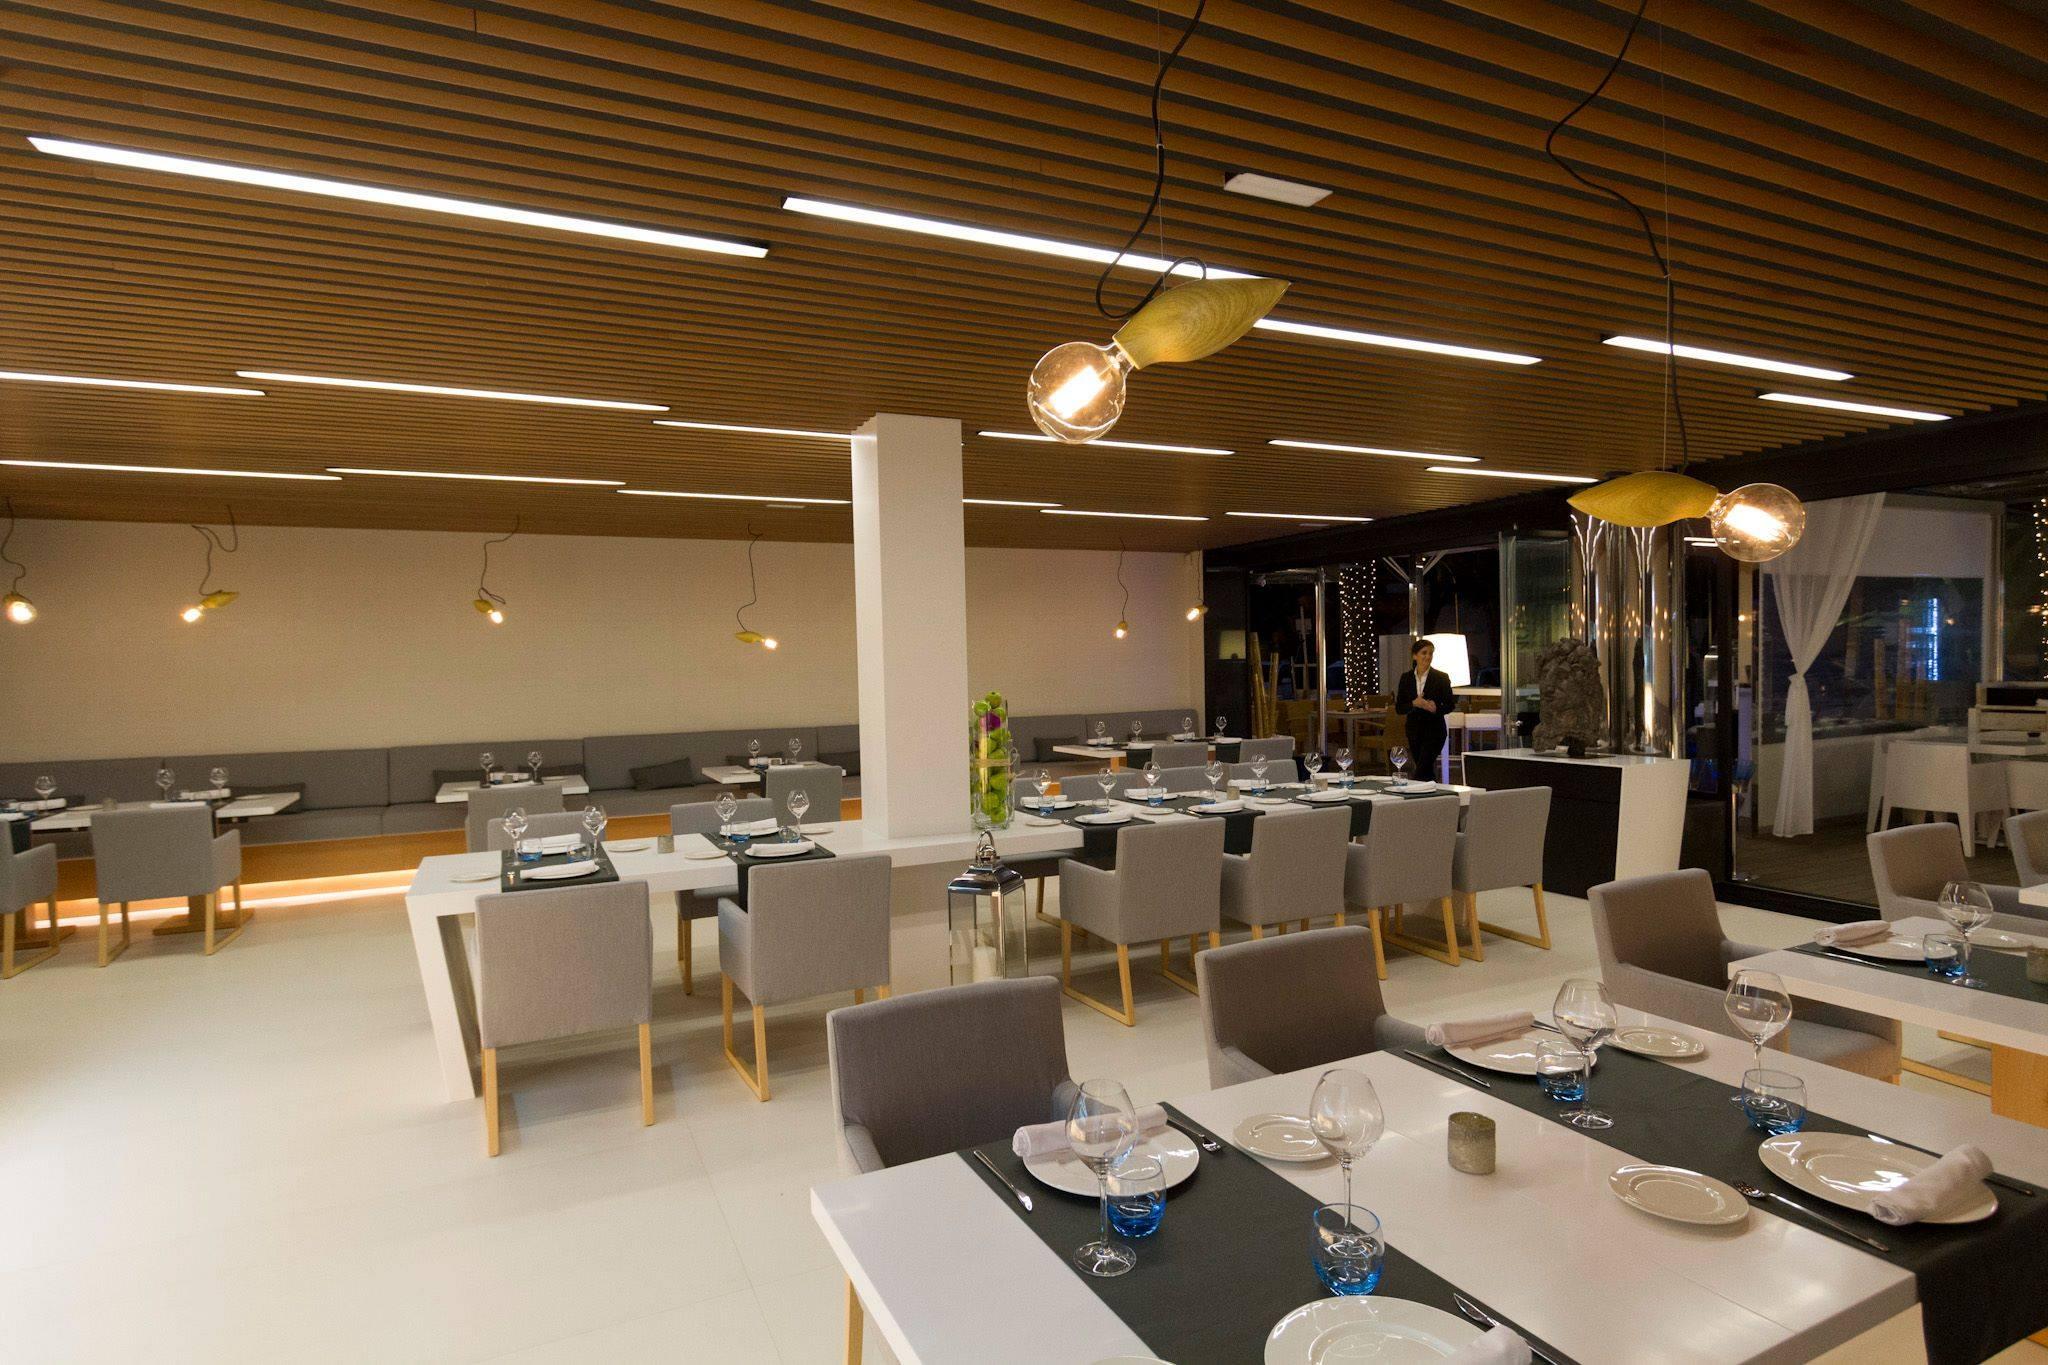 Proyectos de interiores y arquitectura con cer mica grespania for Oficina turismo turquia